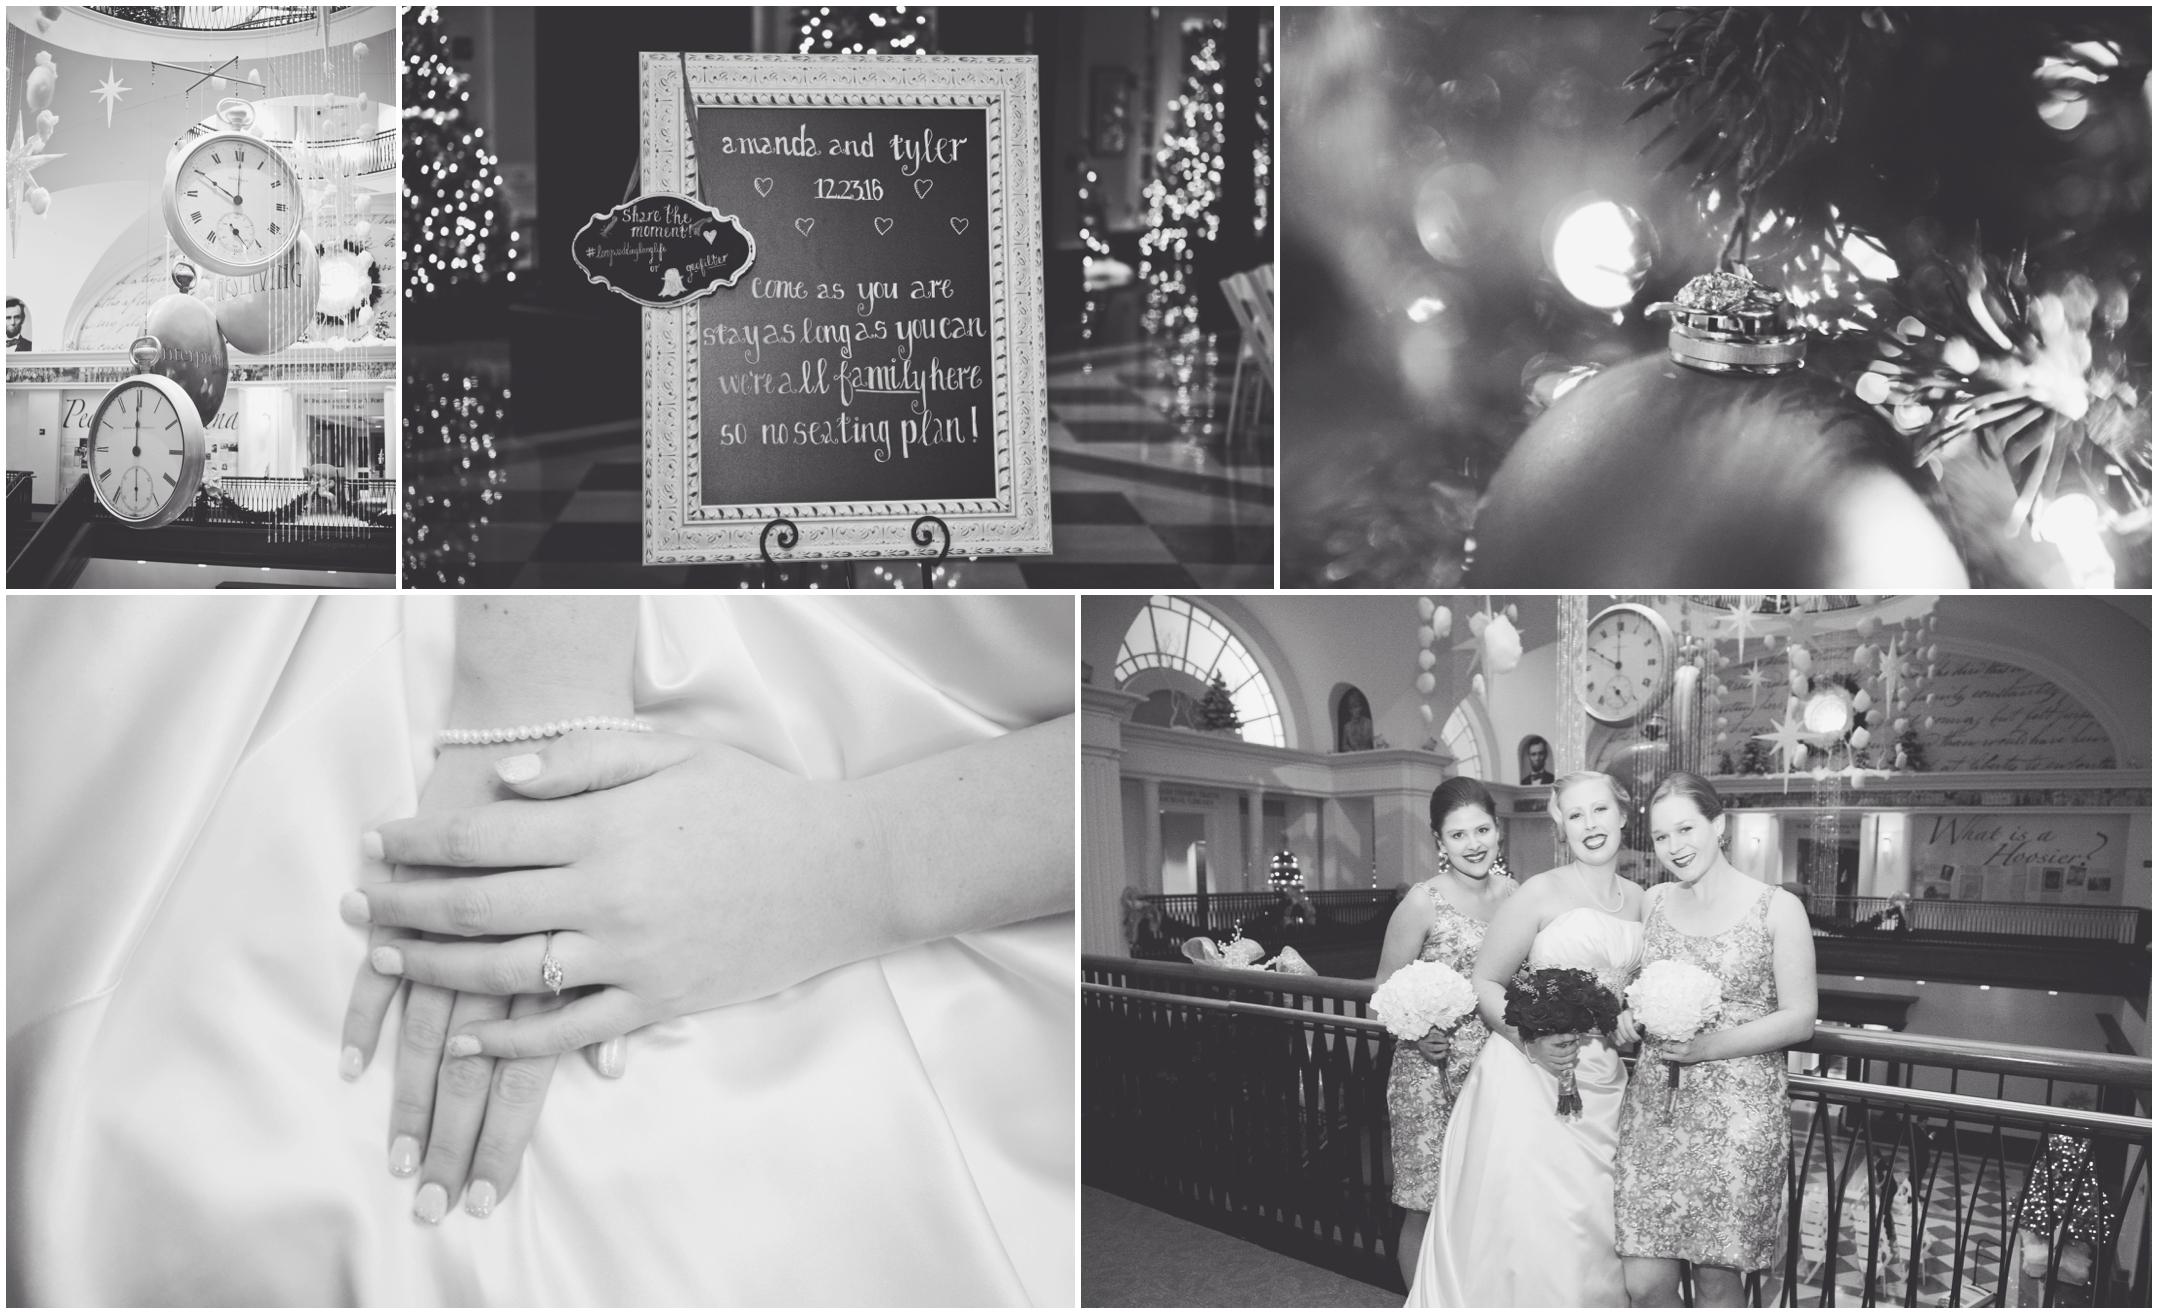 Indianapolis wedding photographer, Indianapolis wedding photography, Indy wedding photographer, Indy wedding photography, Indiana wedding photographer